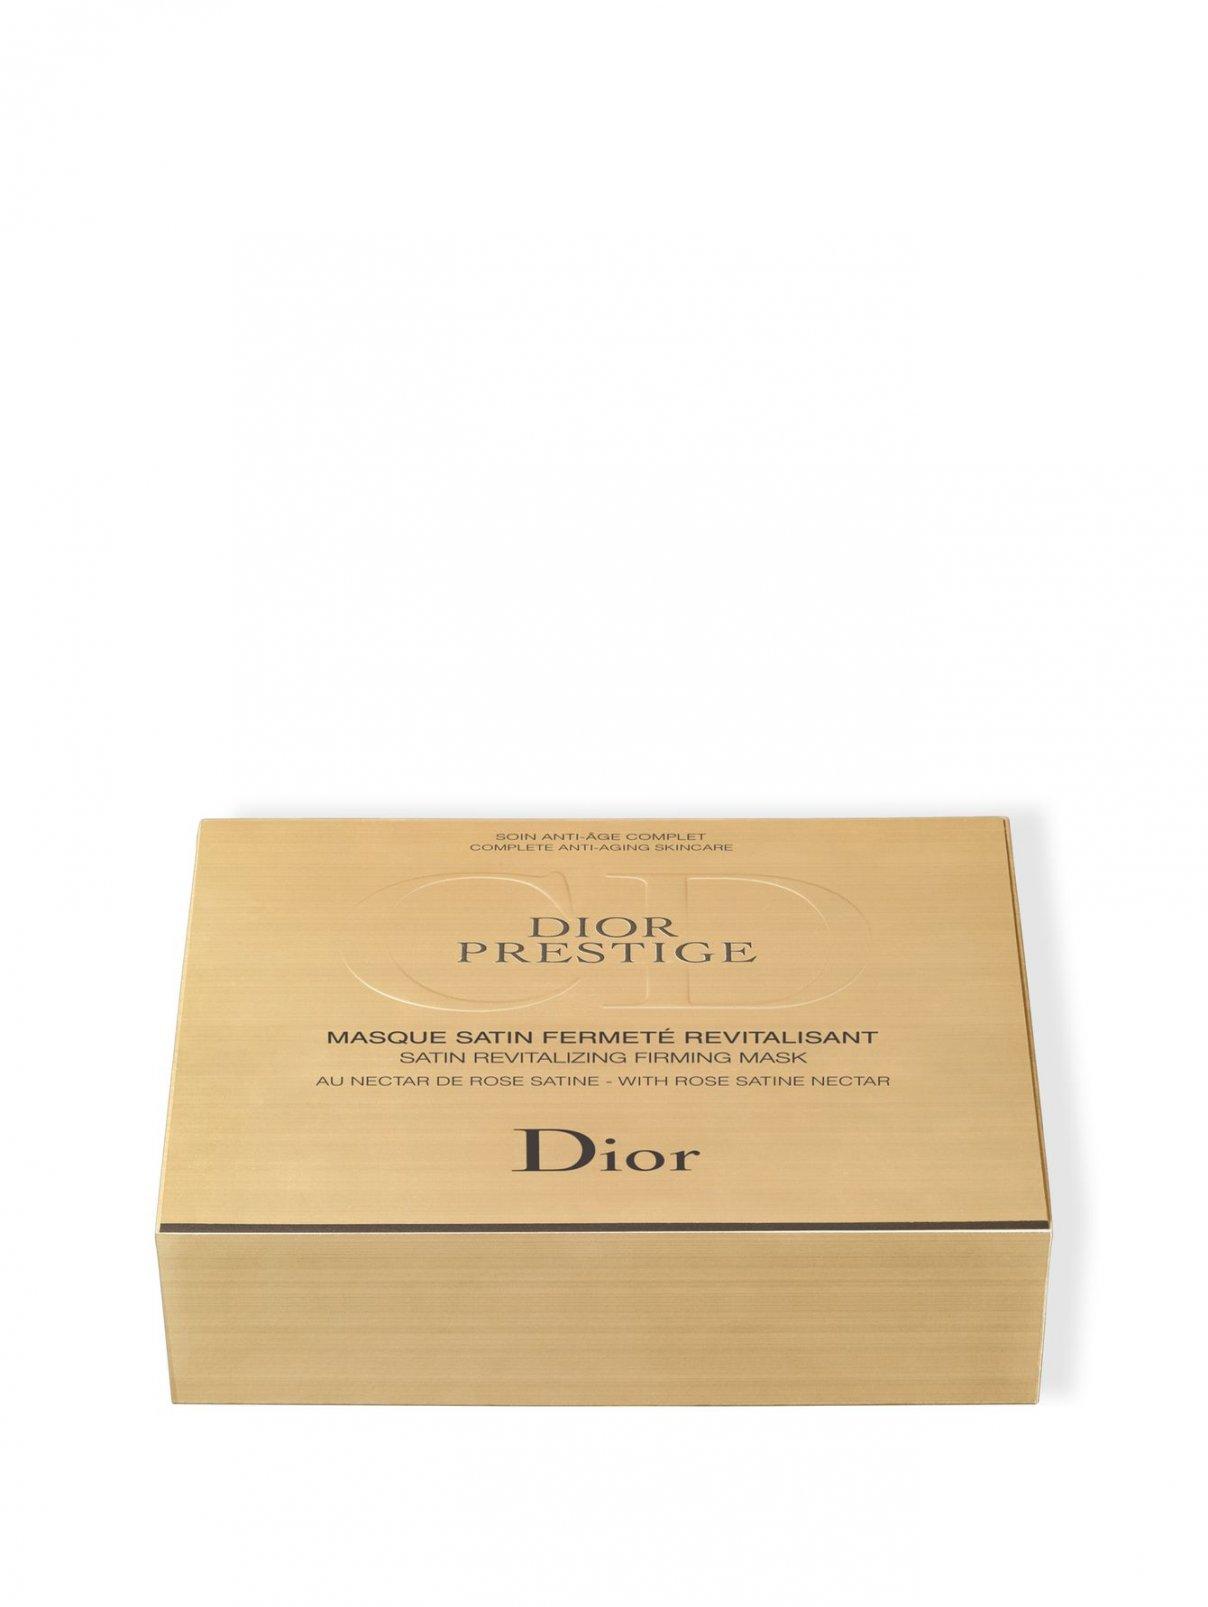 Маска для лица 6х28 мл Prestige Dior  –  Общий вид